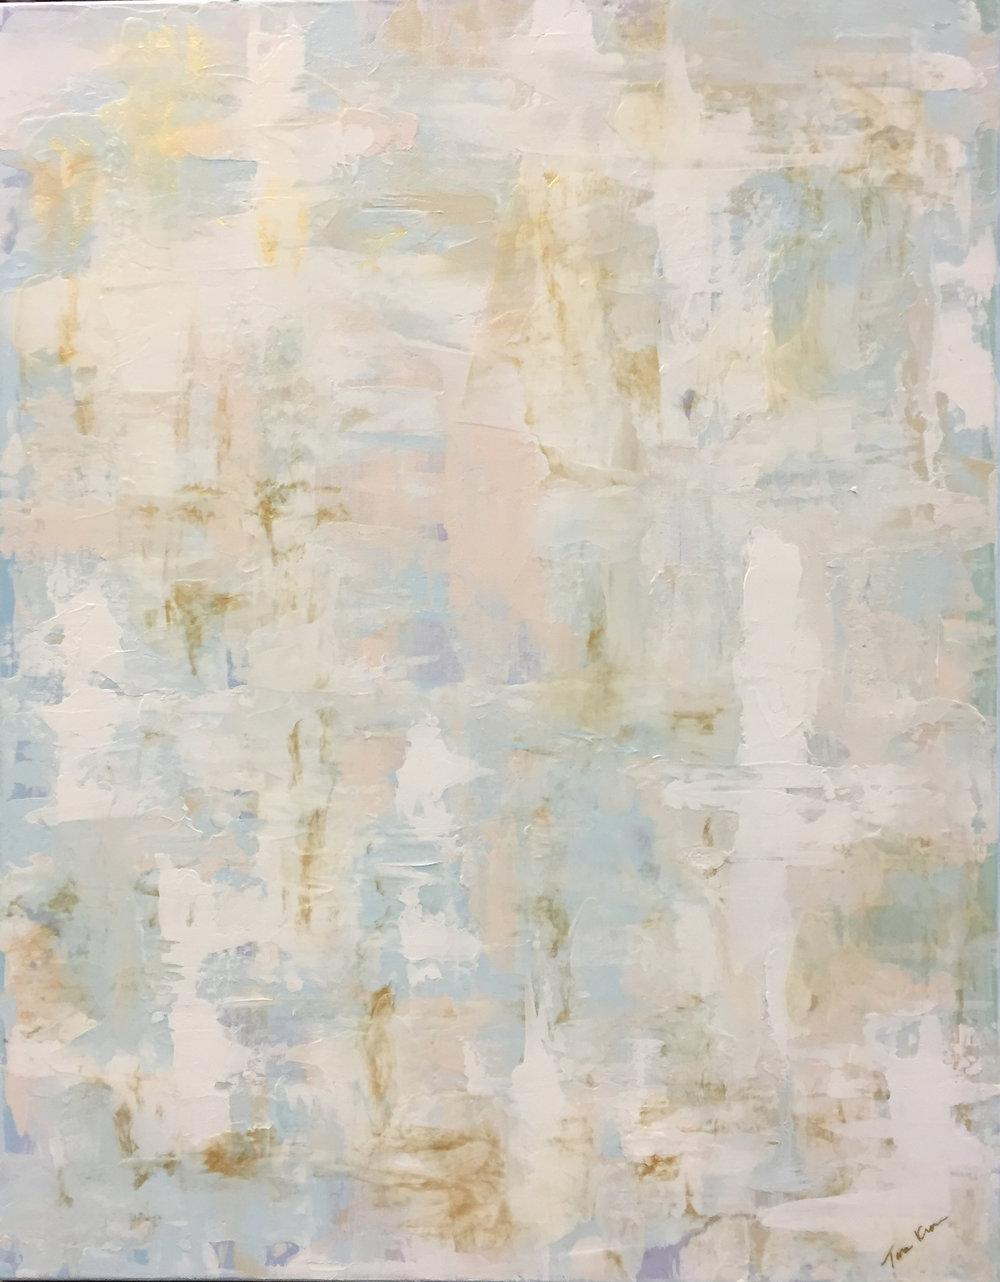 18-24836 Kesner Champagne 28x22 acrylic on canvas.jpg